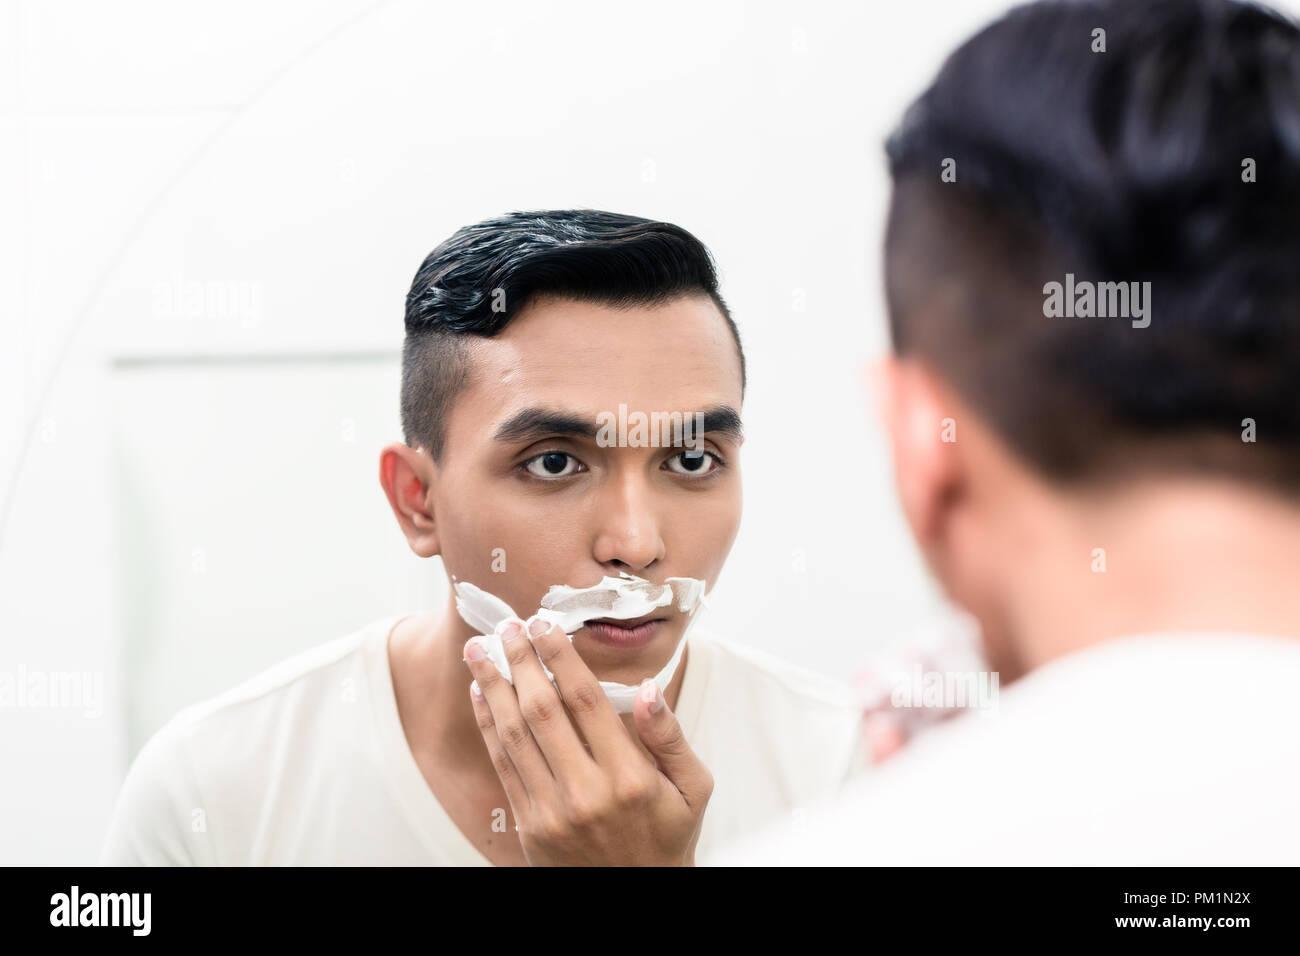 Man applying shaving foam - Stock Image